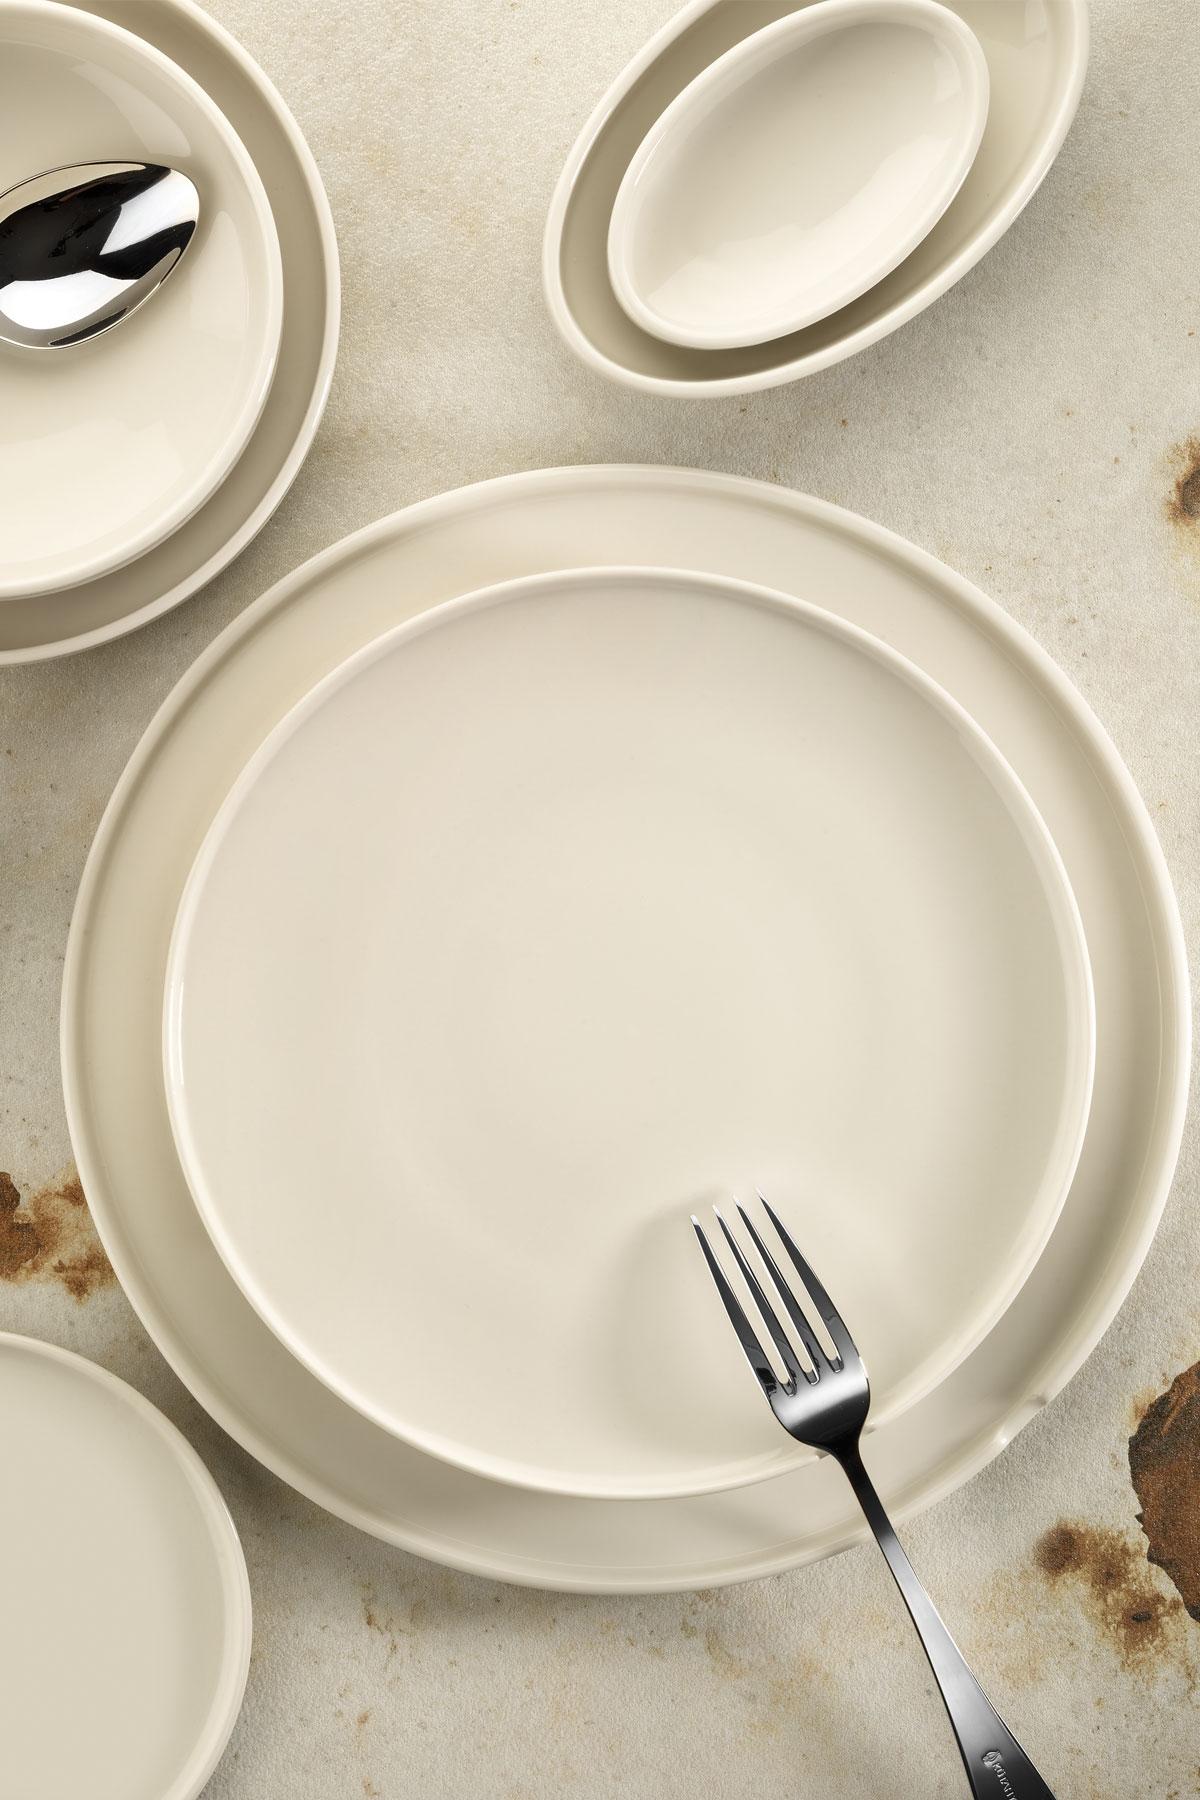 Kütahya Porselen Chef Taste Of 28 cm Spagetti Tabağı Krem